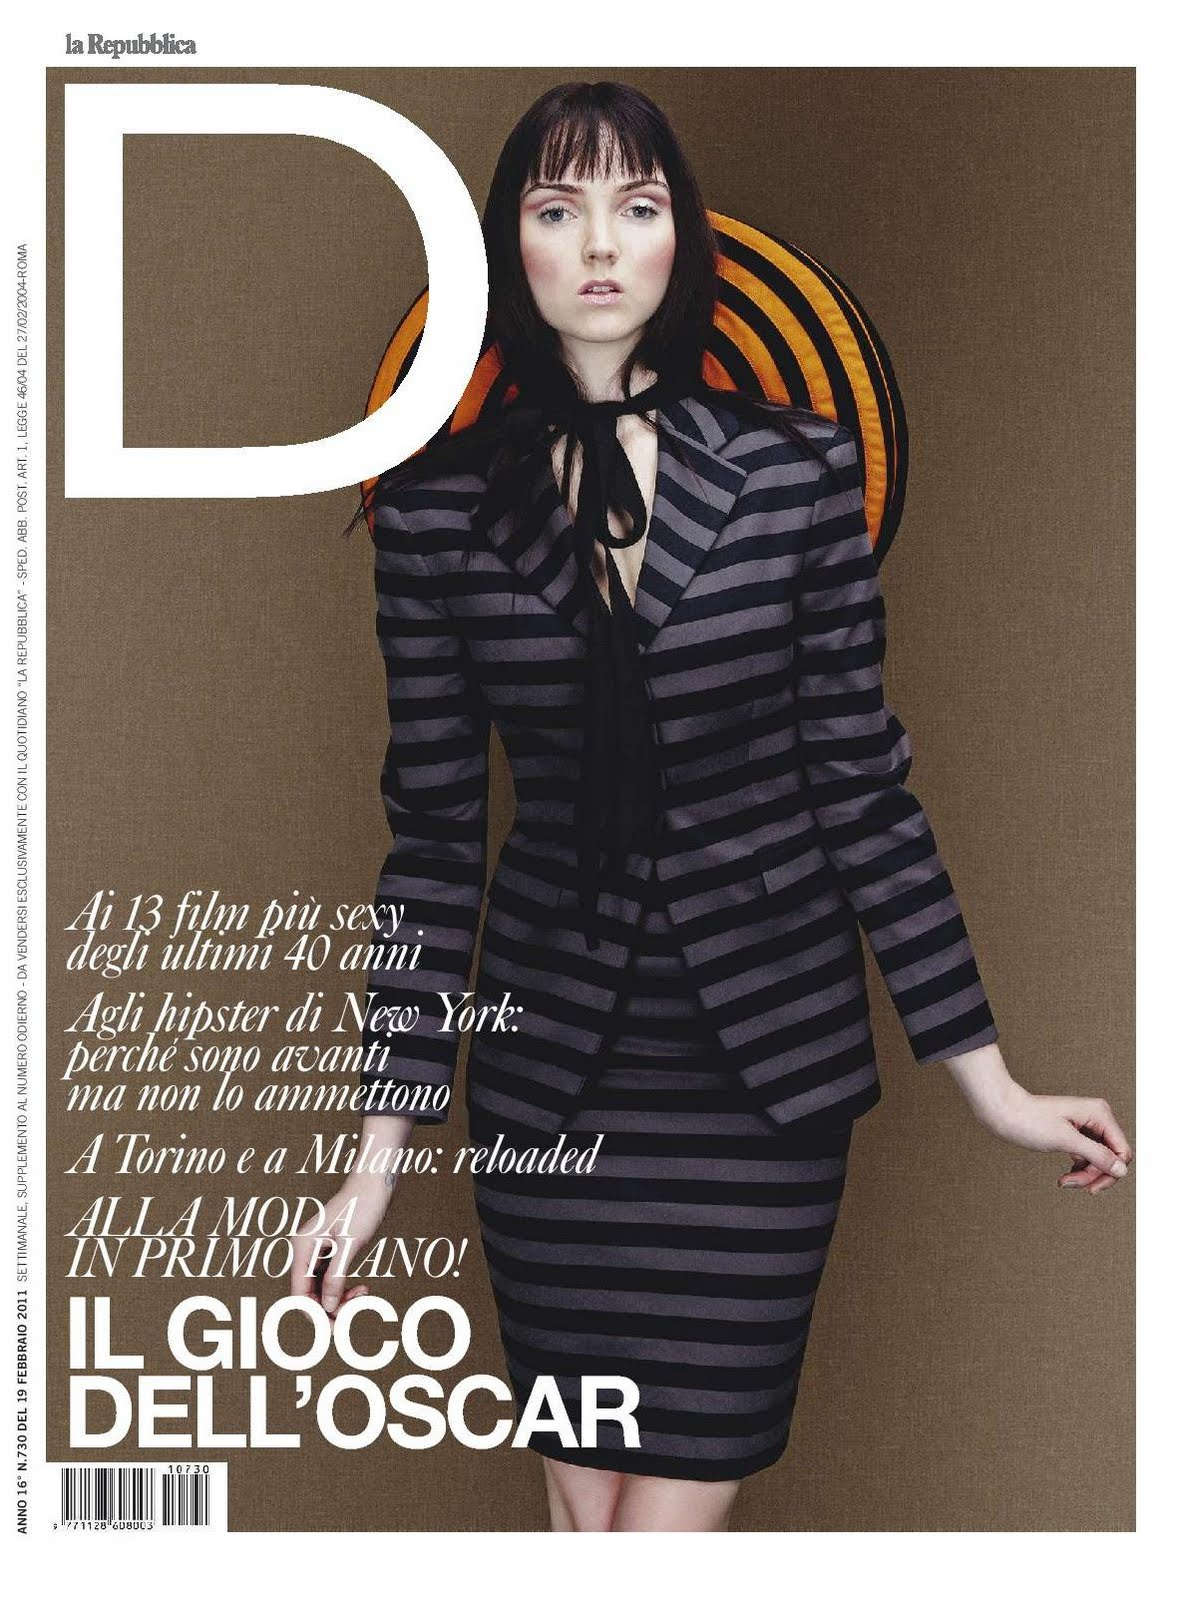 http://1.bp.blogspot.com/-AQ9OVUNlZVI/TWBRdTGlKII/AAAAAAAAFG0/pLO8ca90eXM/s1600/Lily+Cole+by+Julian+Broad+%2528D+la+Repubblica+%2523+730+February+2011%2529.jpeg.jpg